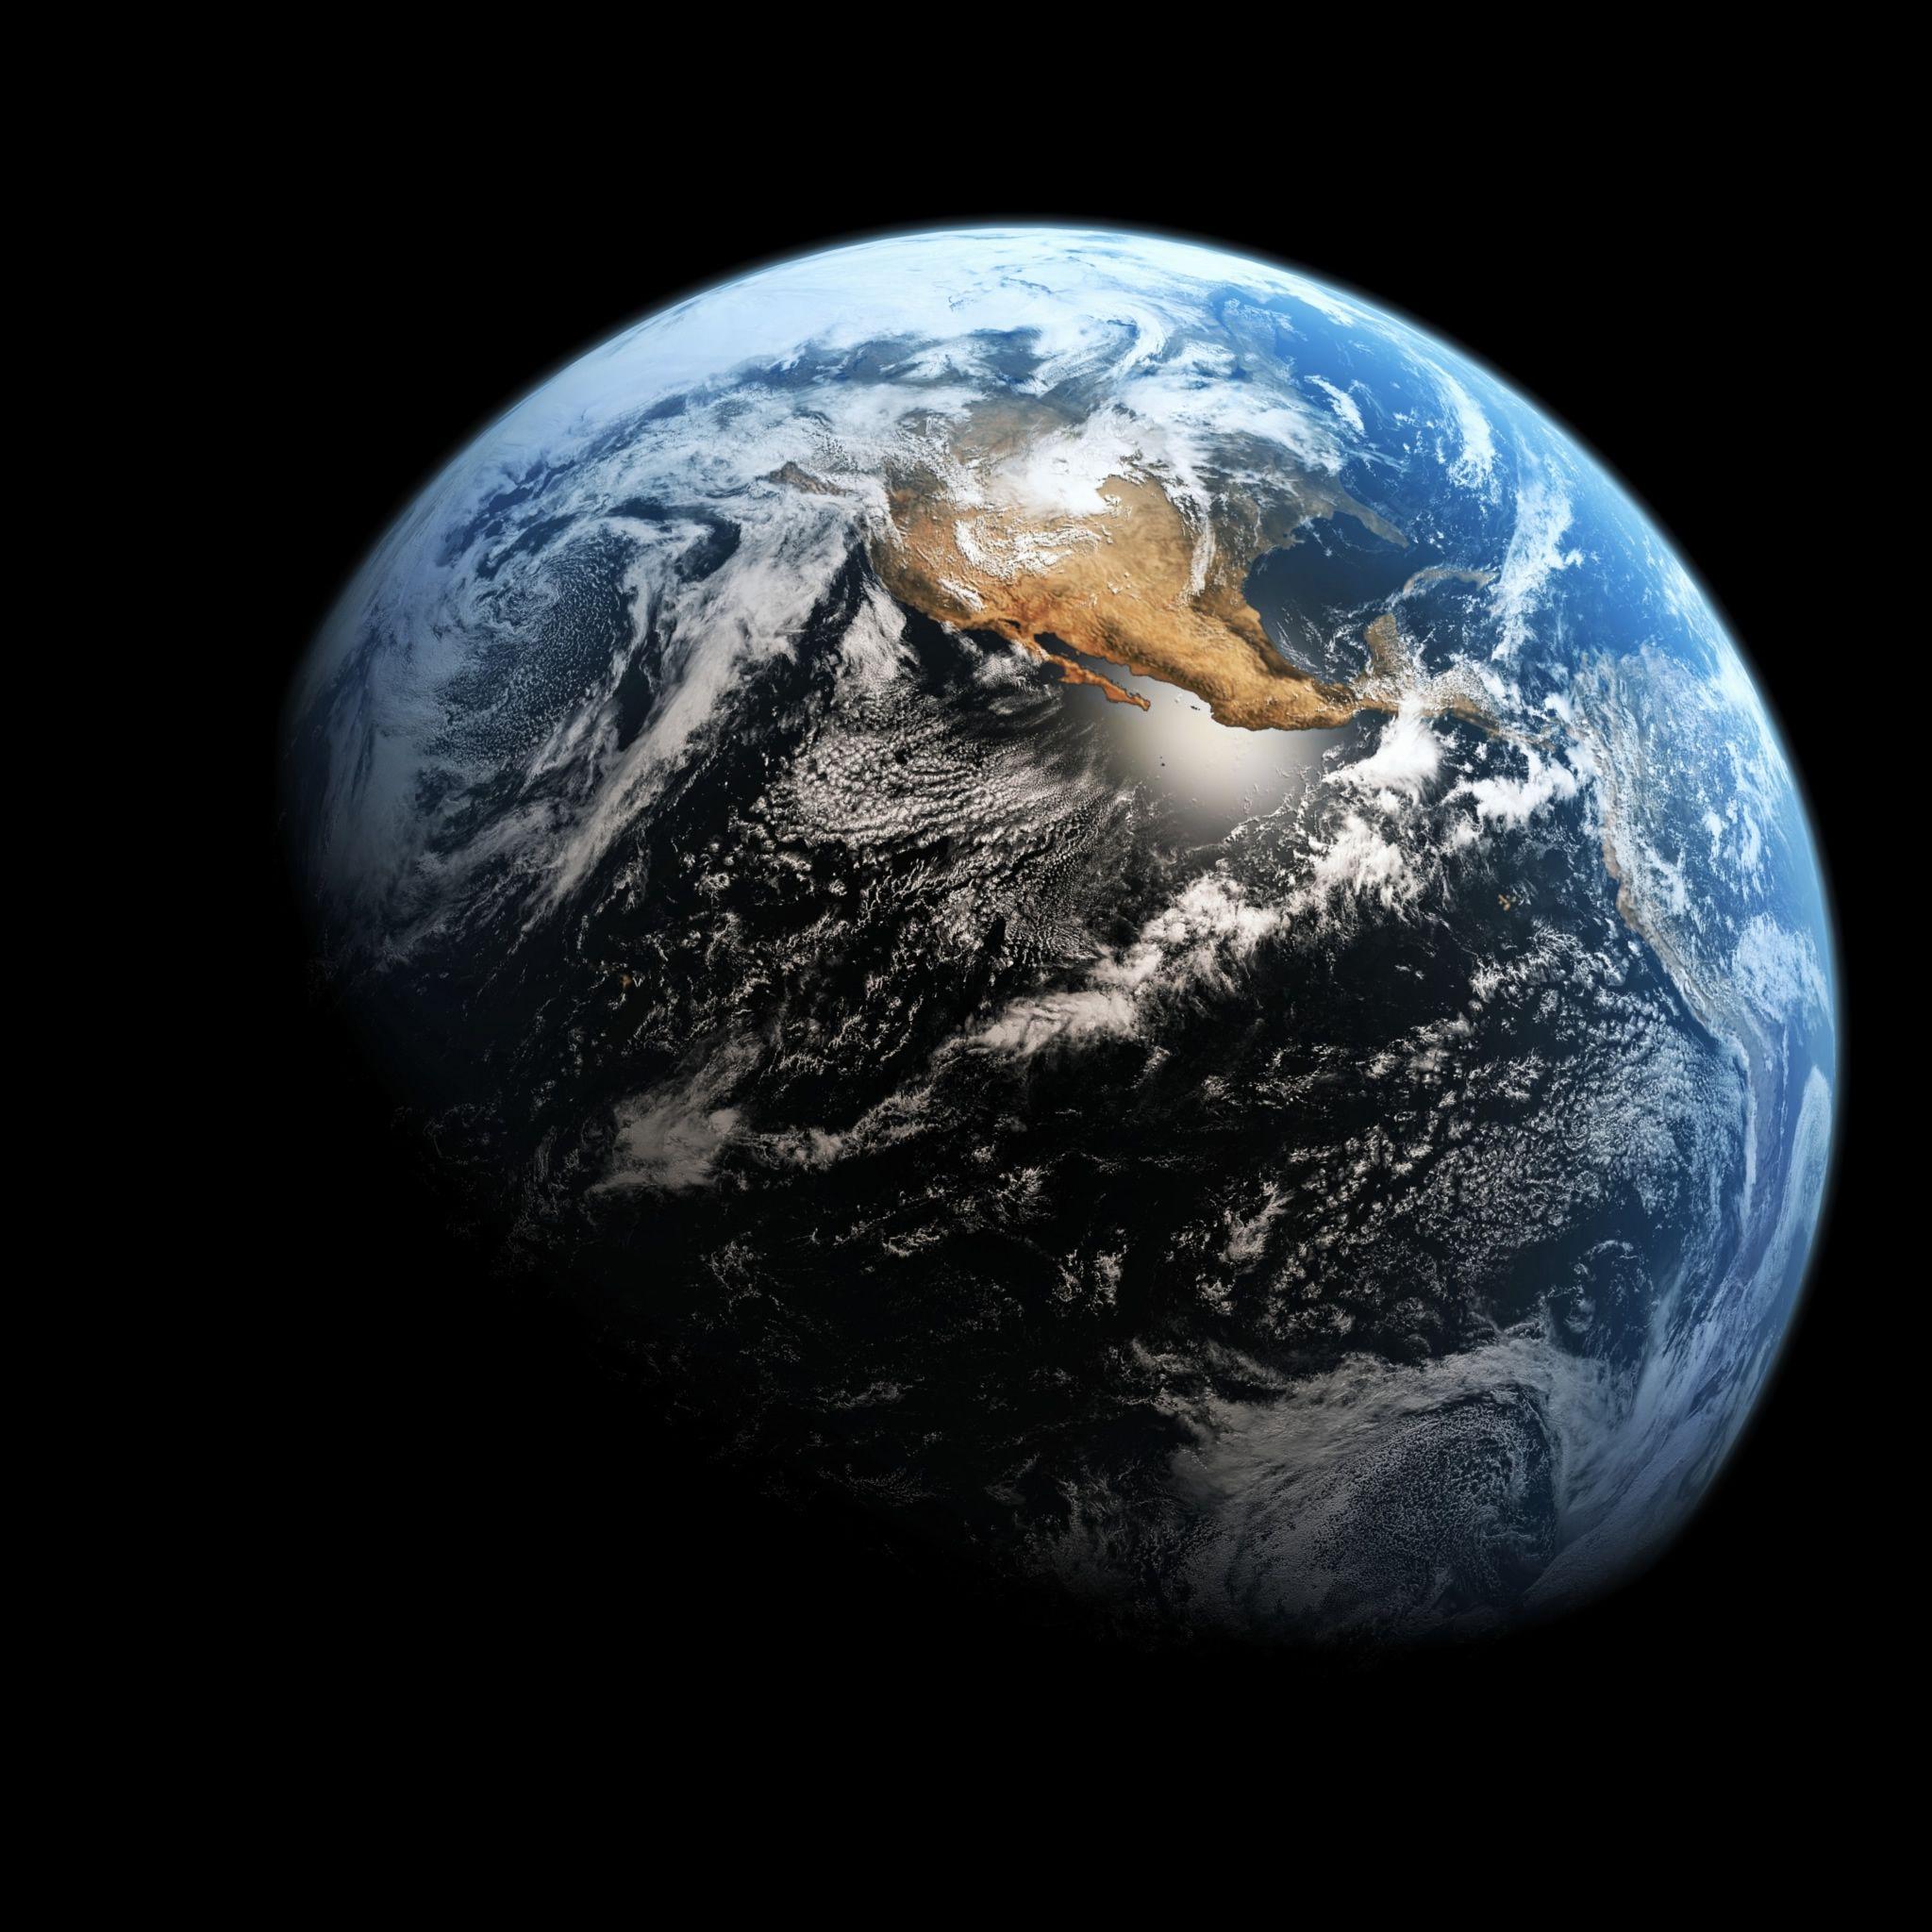 Planet Earth Wallpaper Wallpapers In Jpg Format For Free Download Wallpaper Earth Earth Hd Planets Wallpaper Earth hd wallpaper download